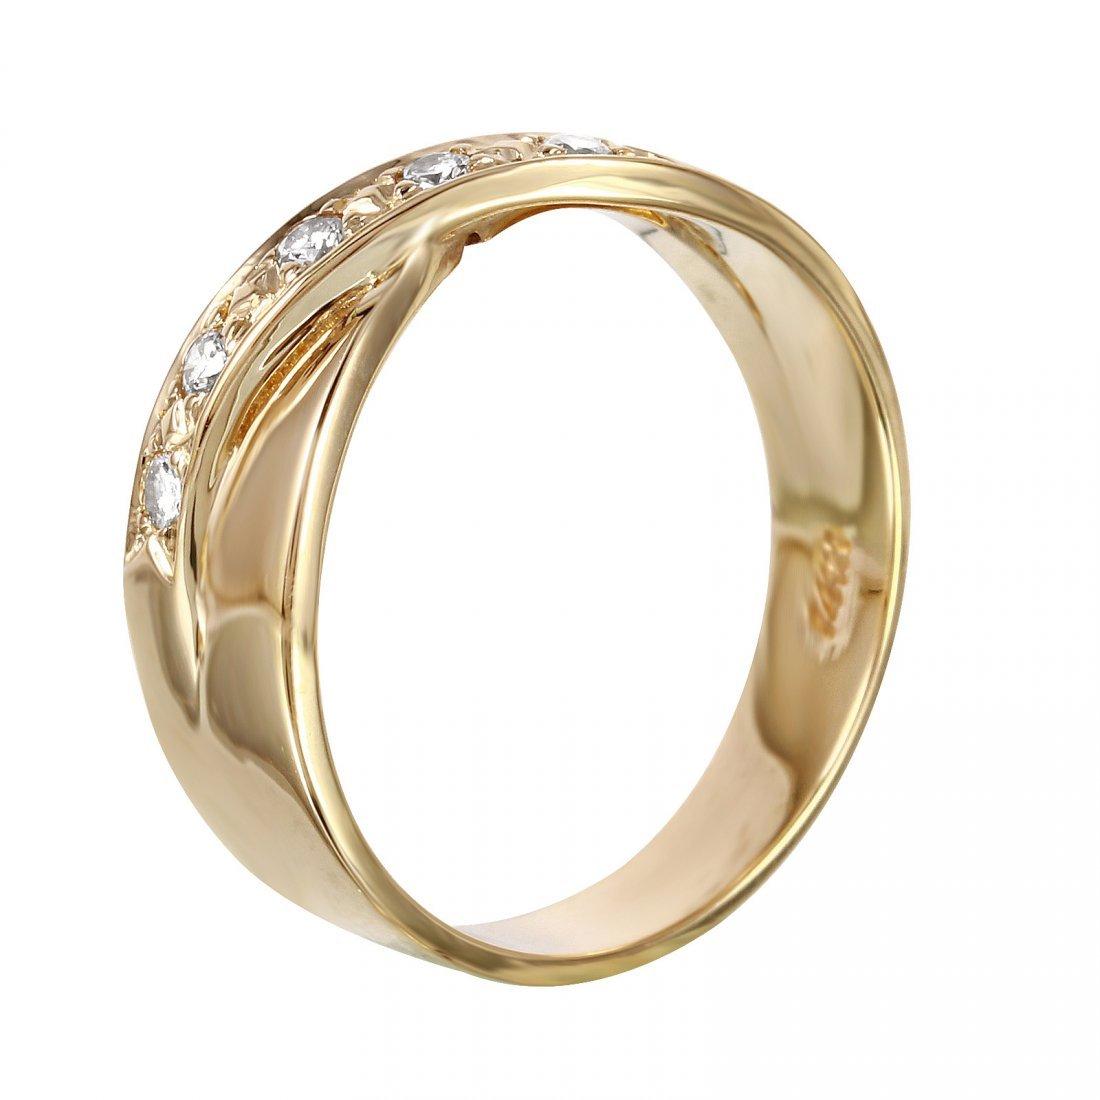 14K Yellow Gold Diamond Crossover Ring, 0.10 ctw - 2